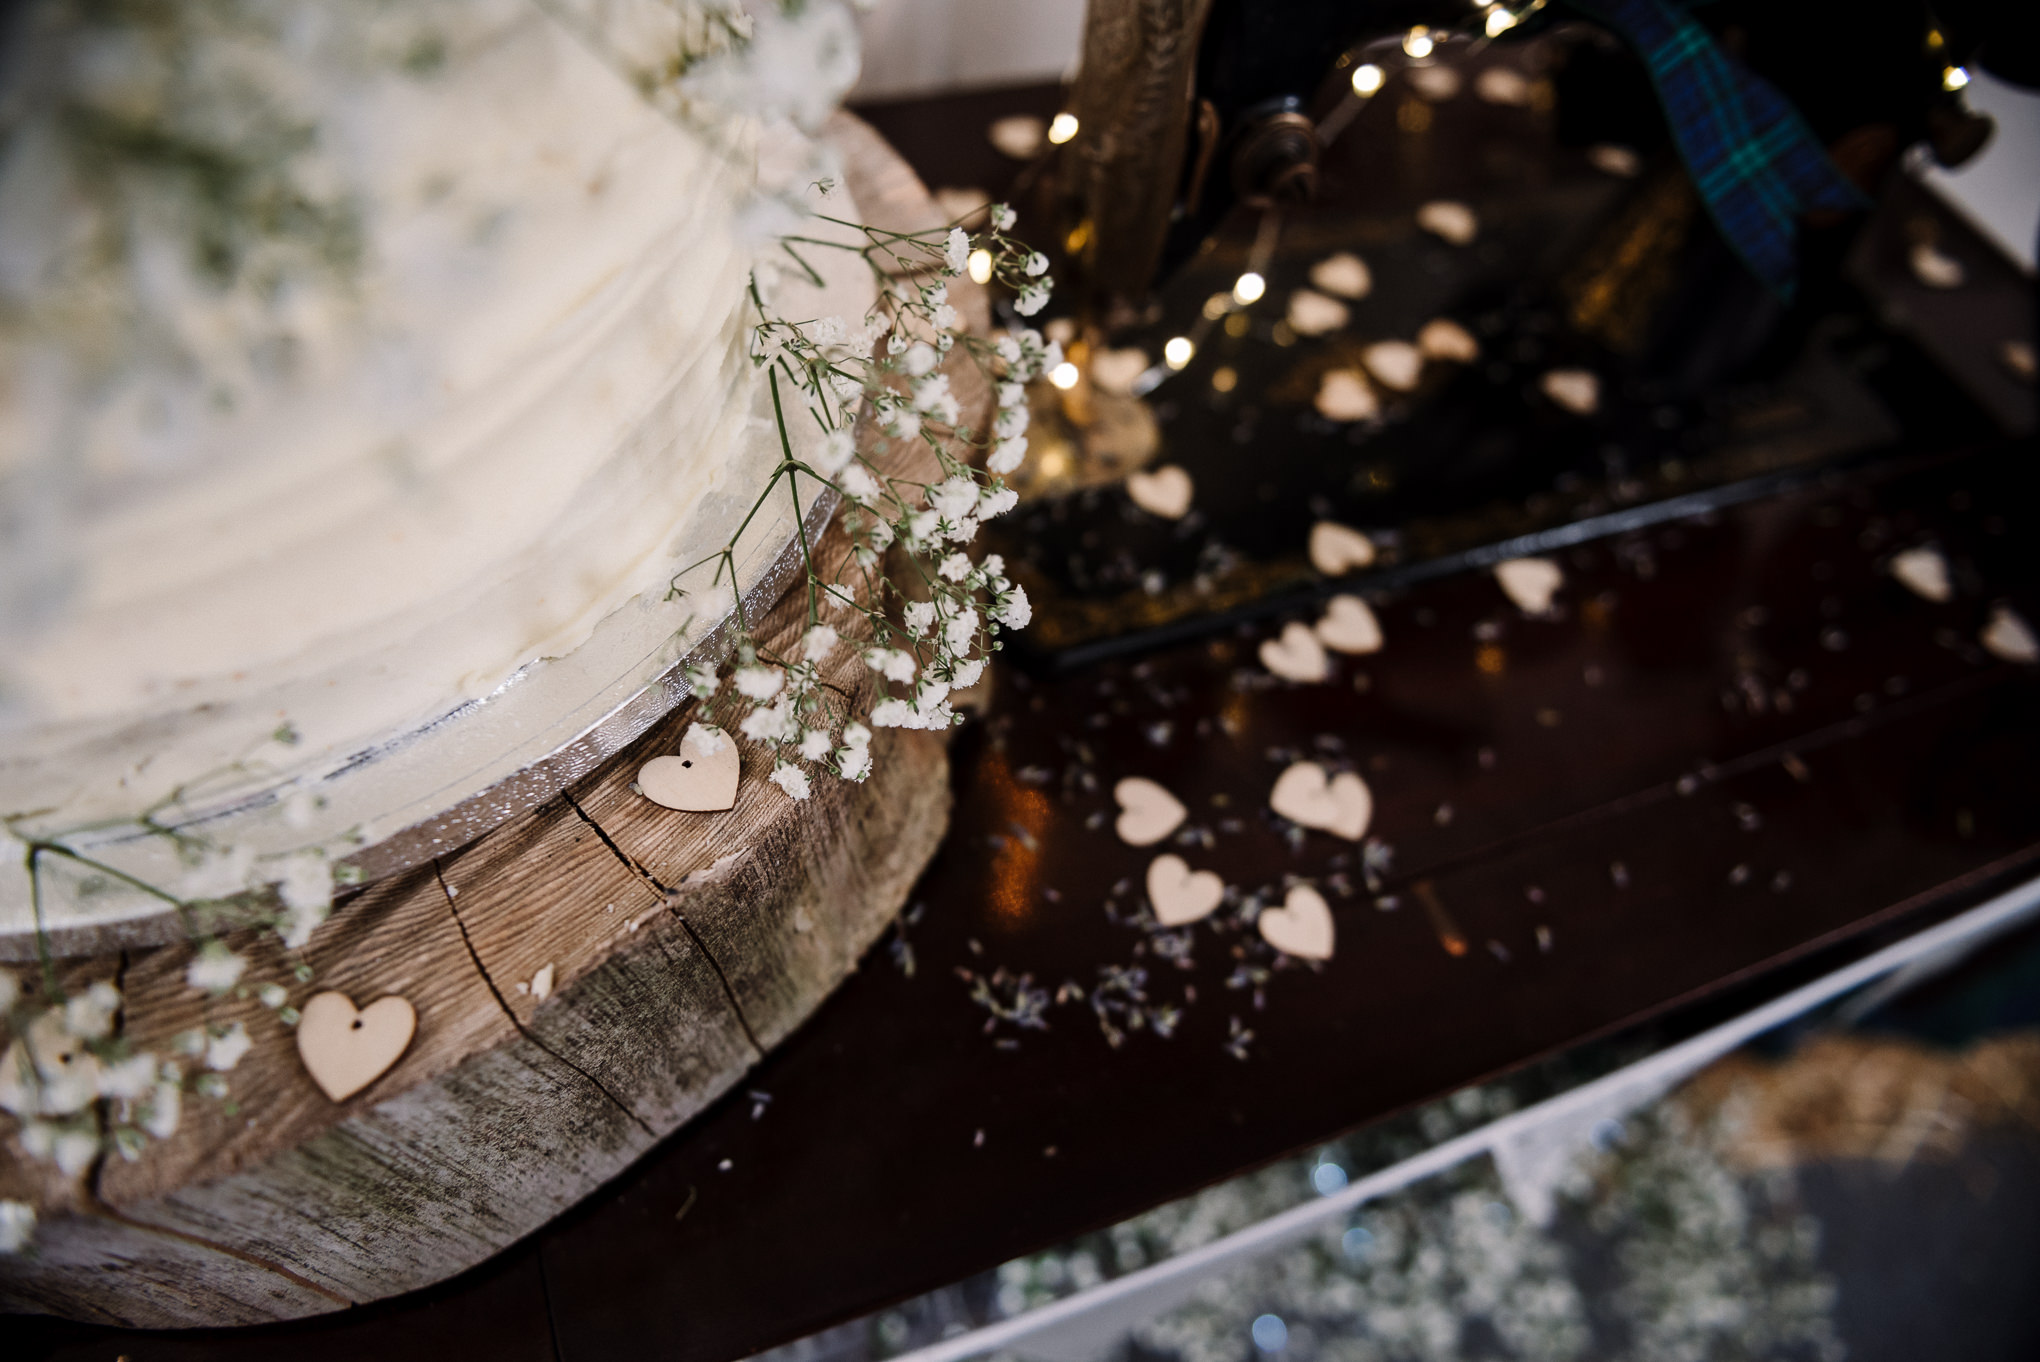 Close up photo of rustic wedding cake and gypsophila